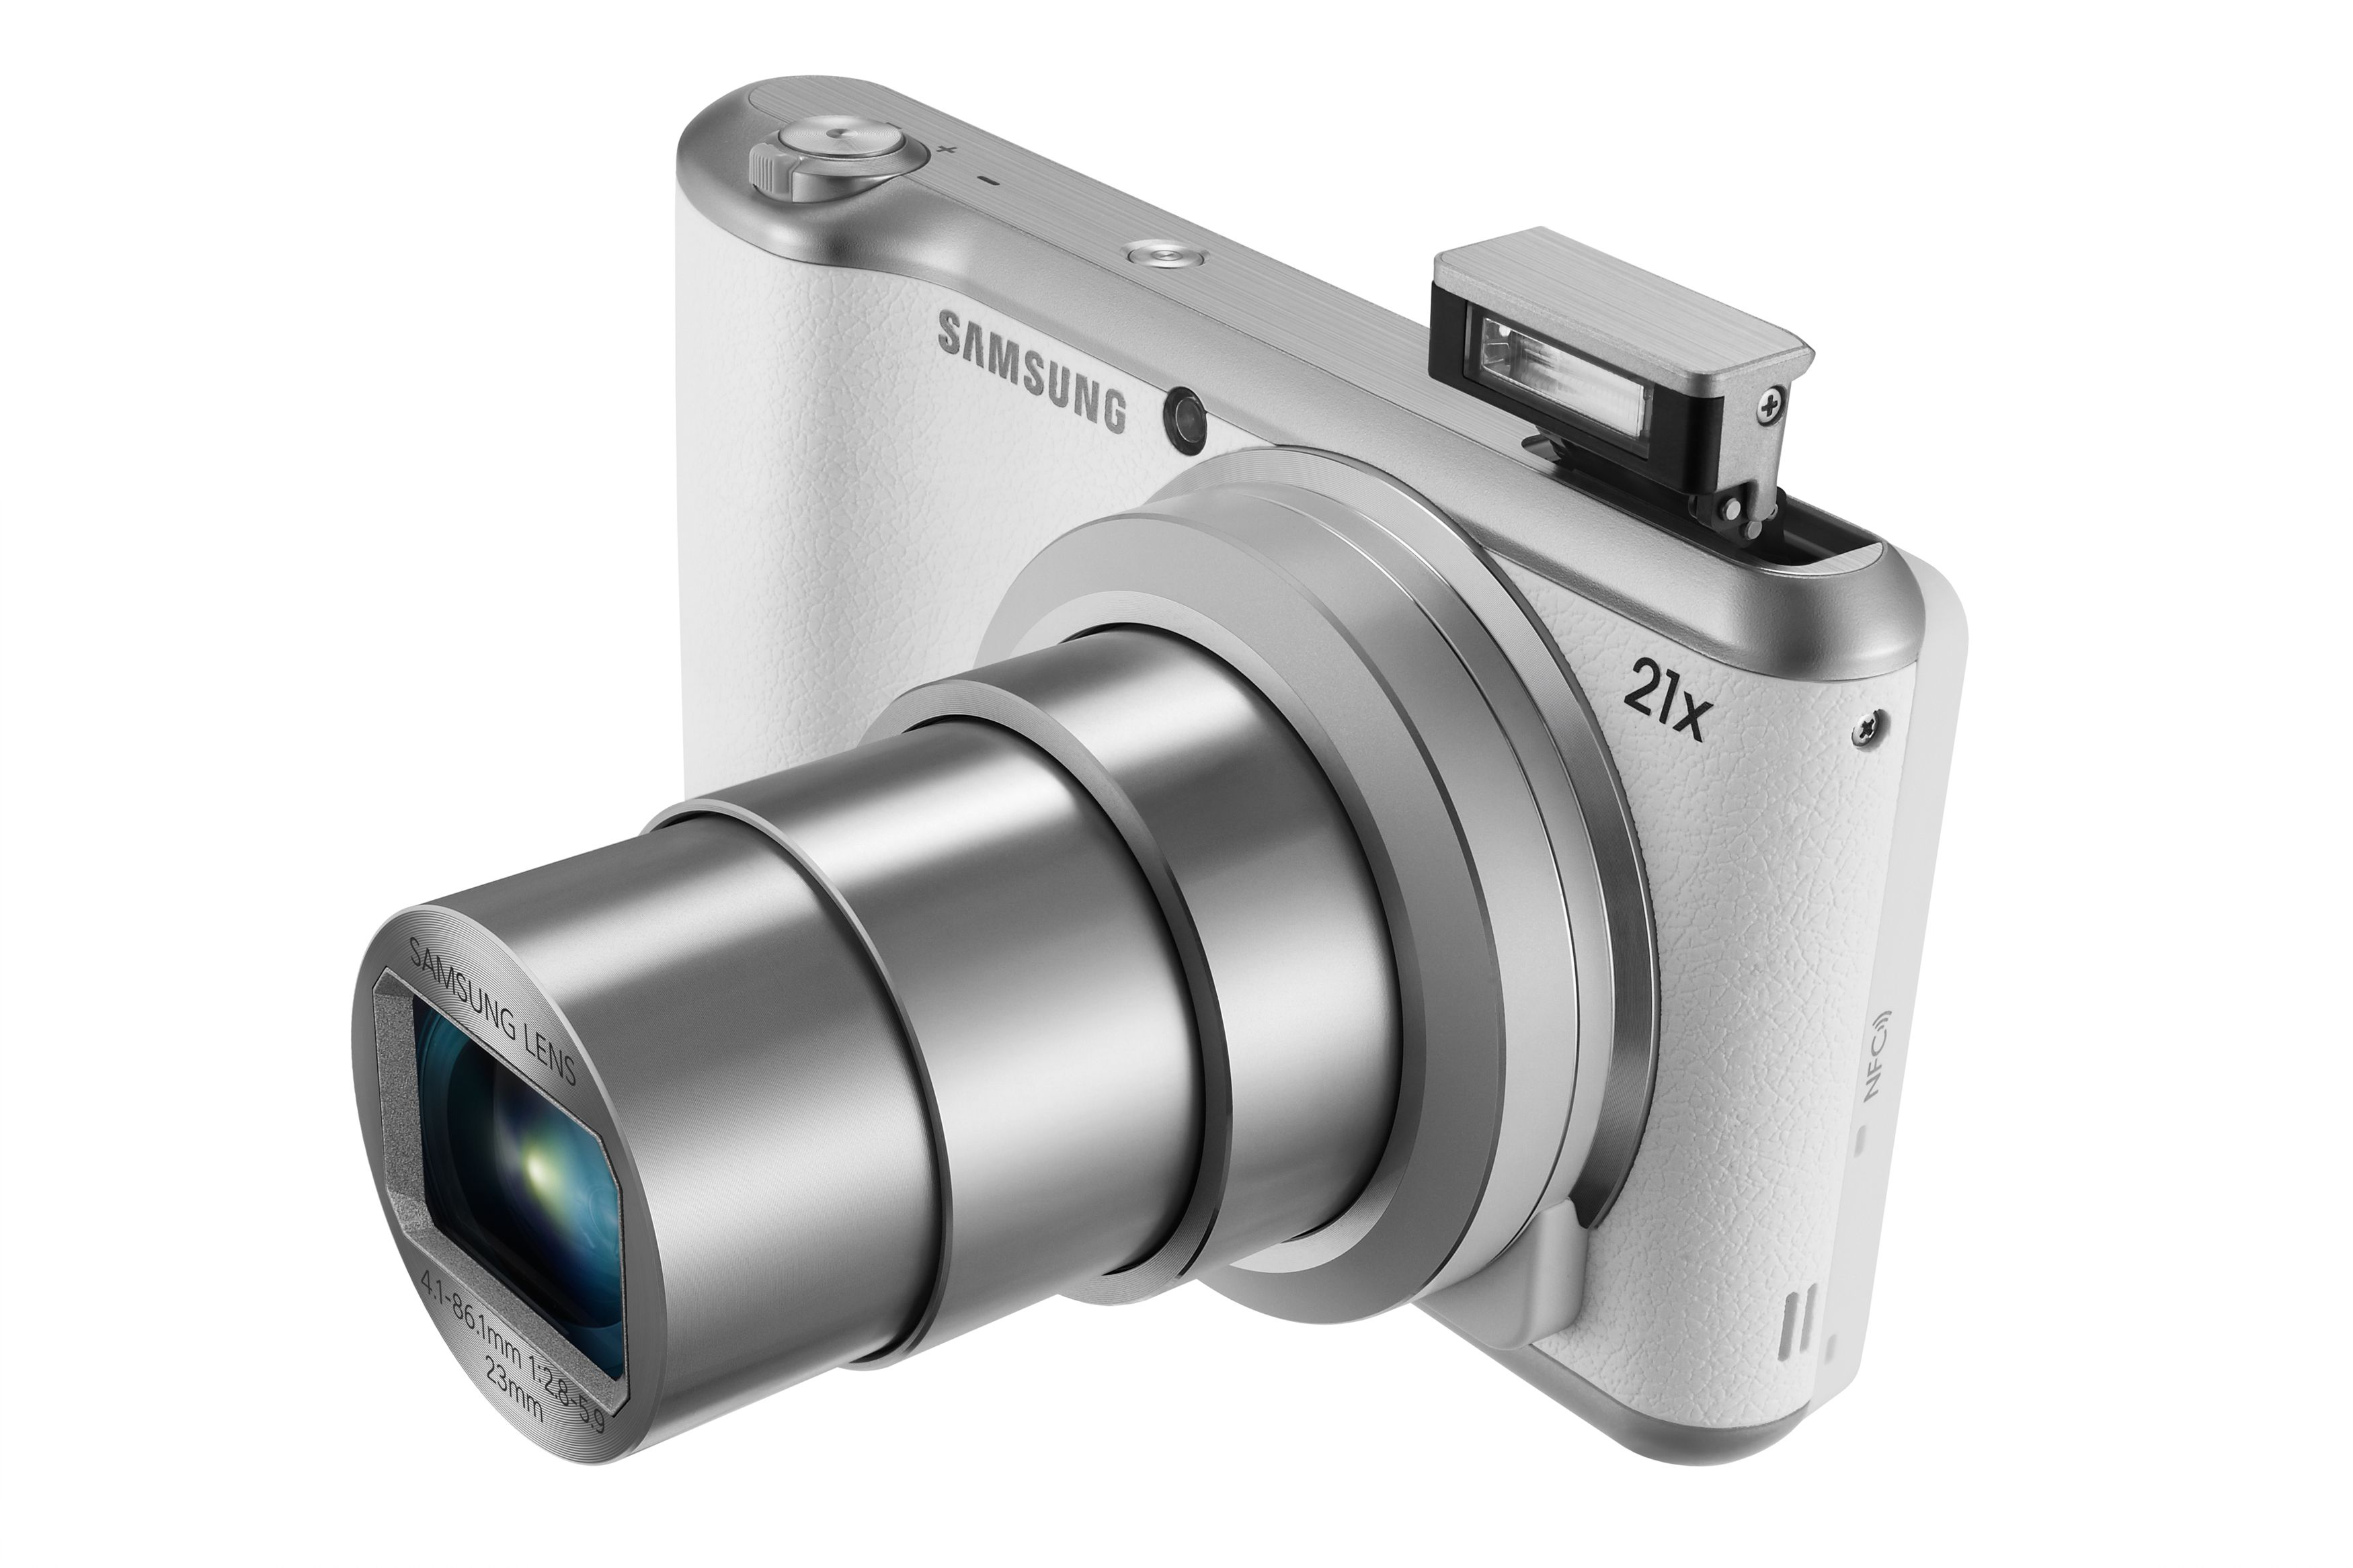 Samsung GALAXY Camera 2-21-zoom lens